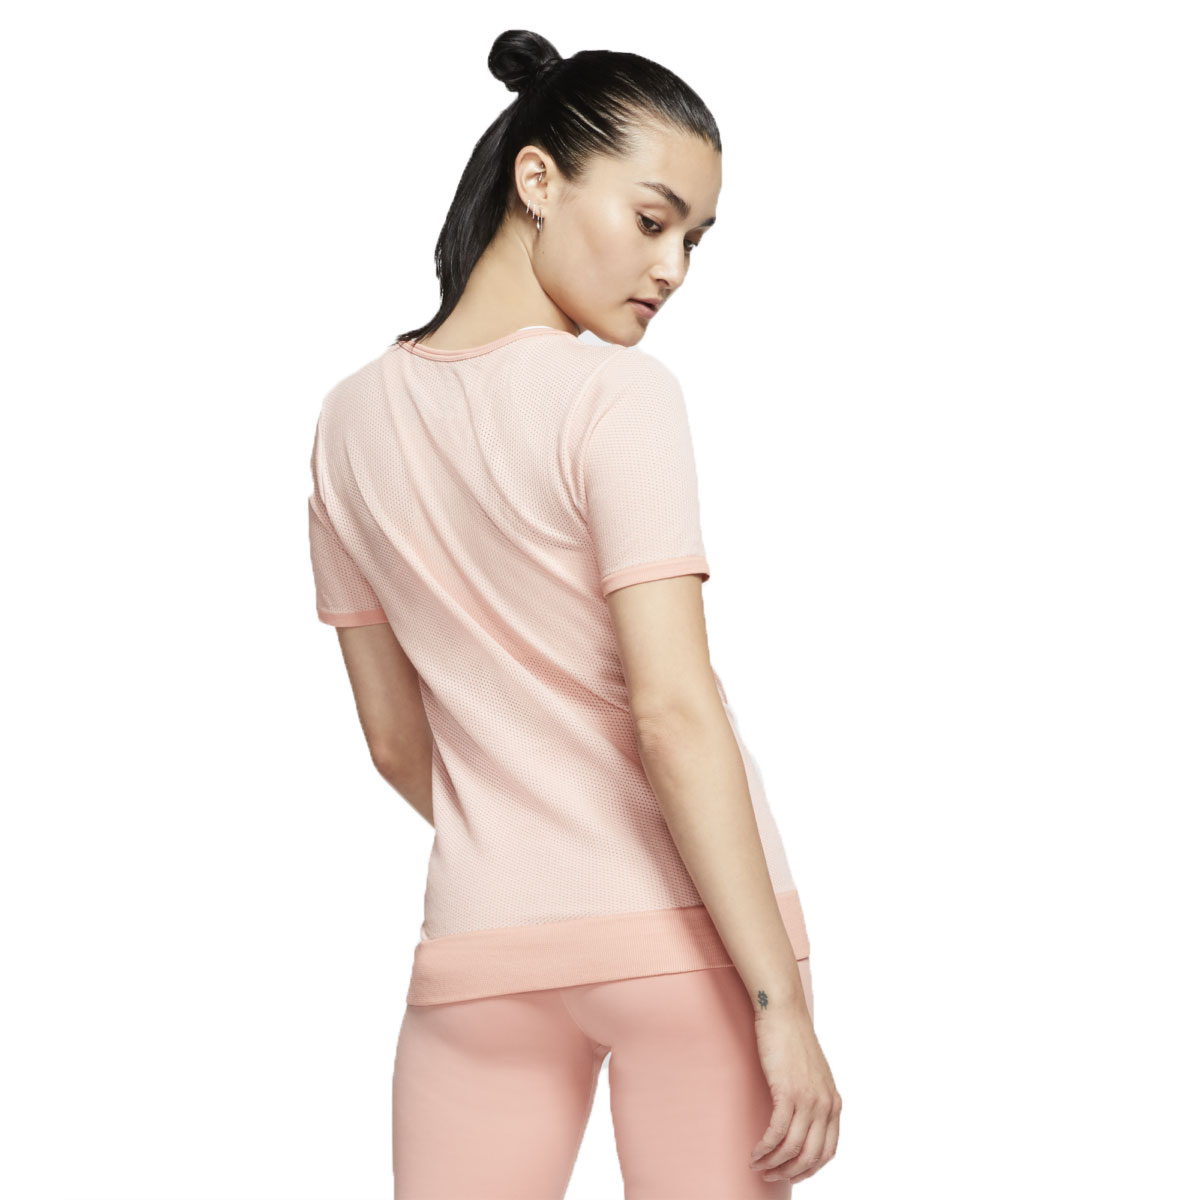 Women's Nike Infinite Short Sleeve, , large, image 3